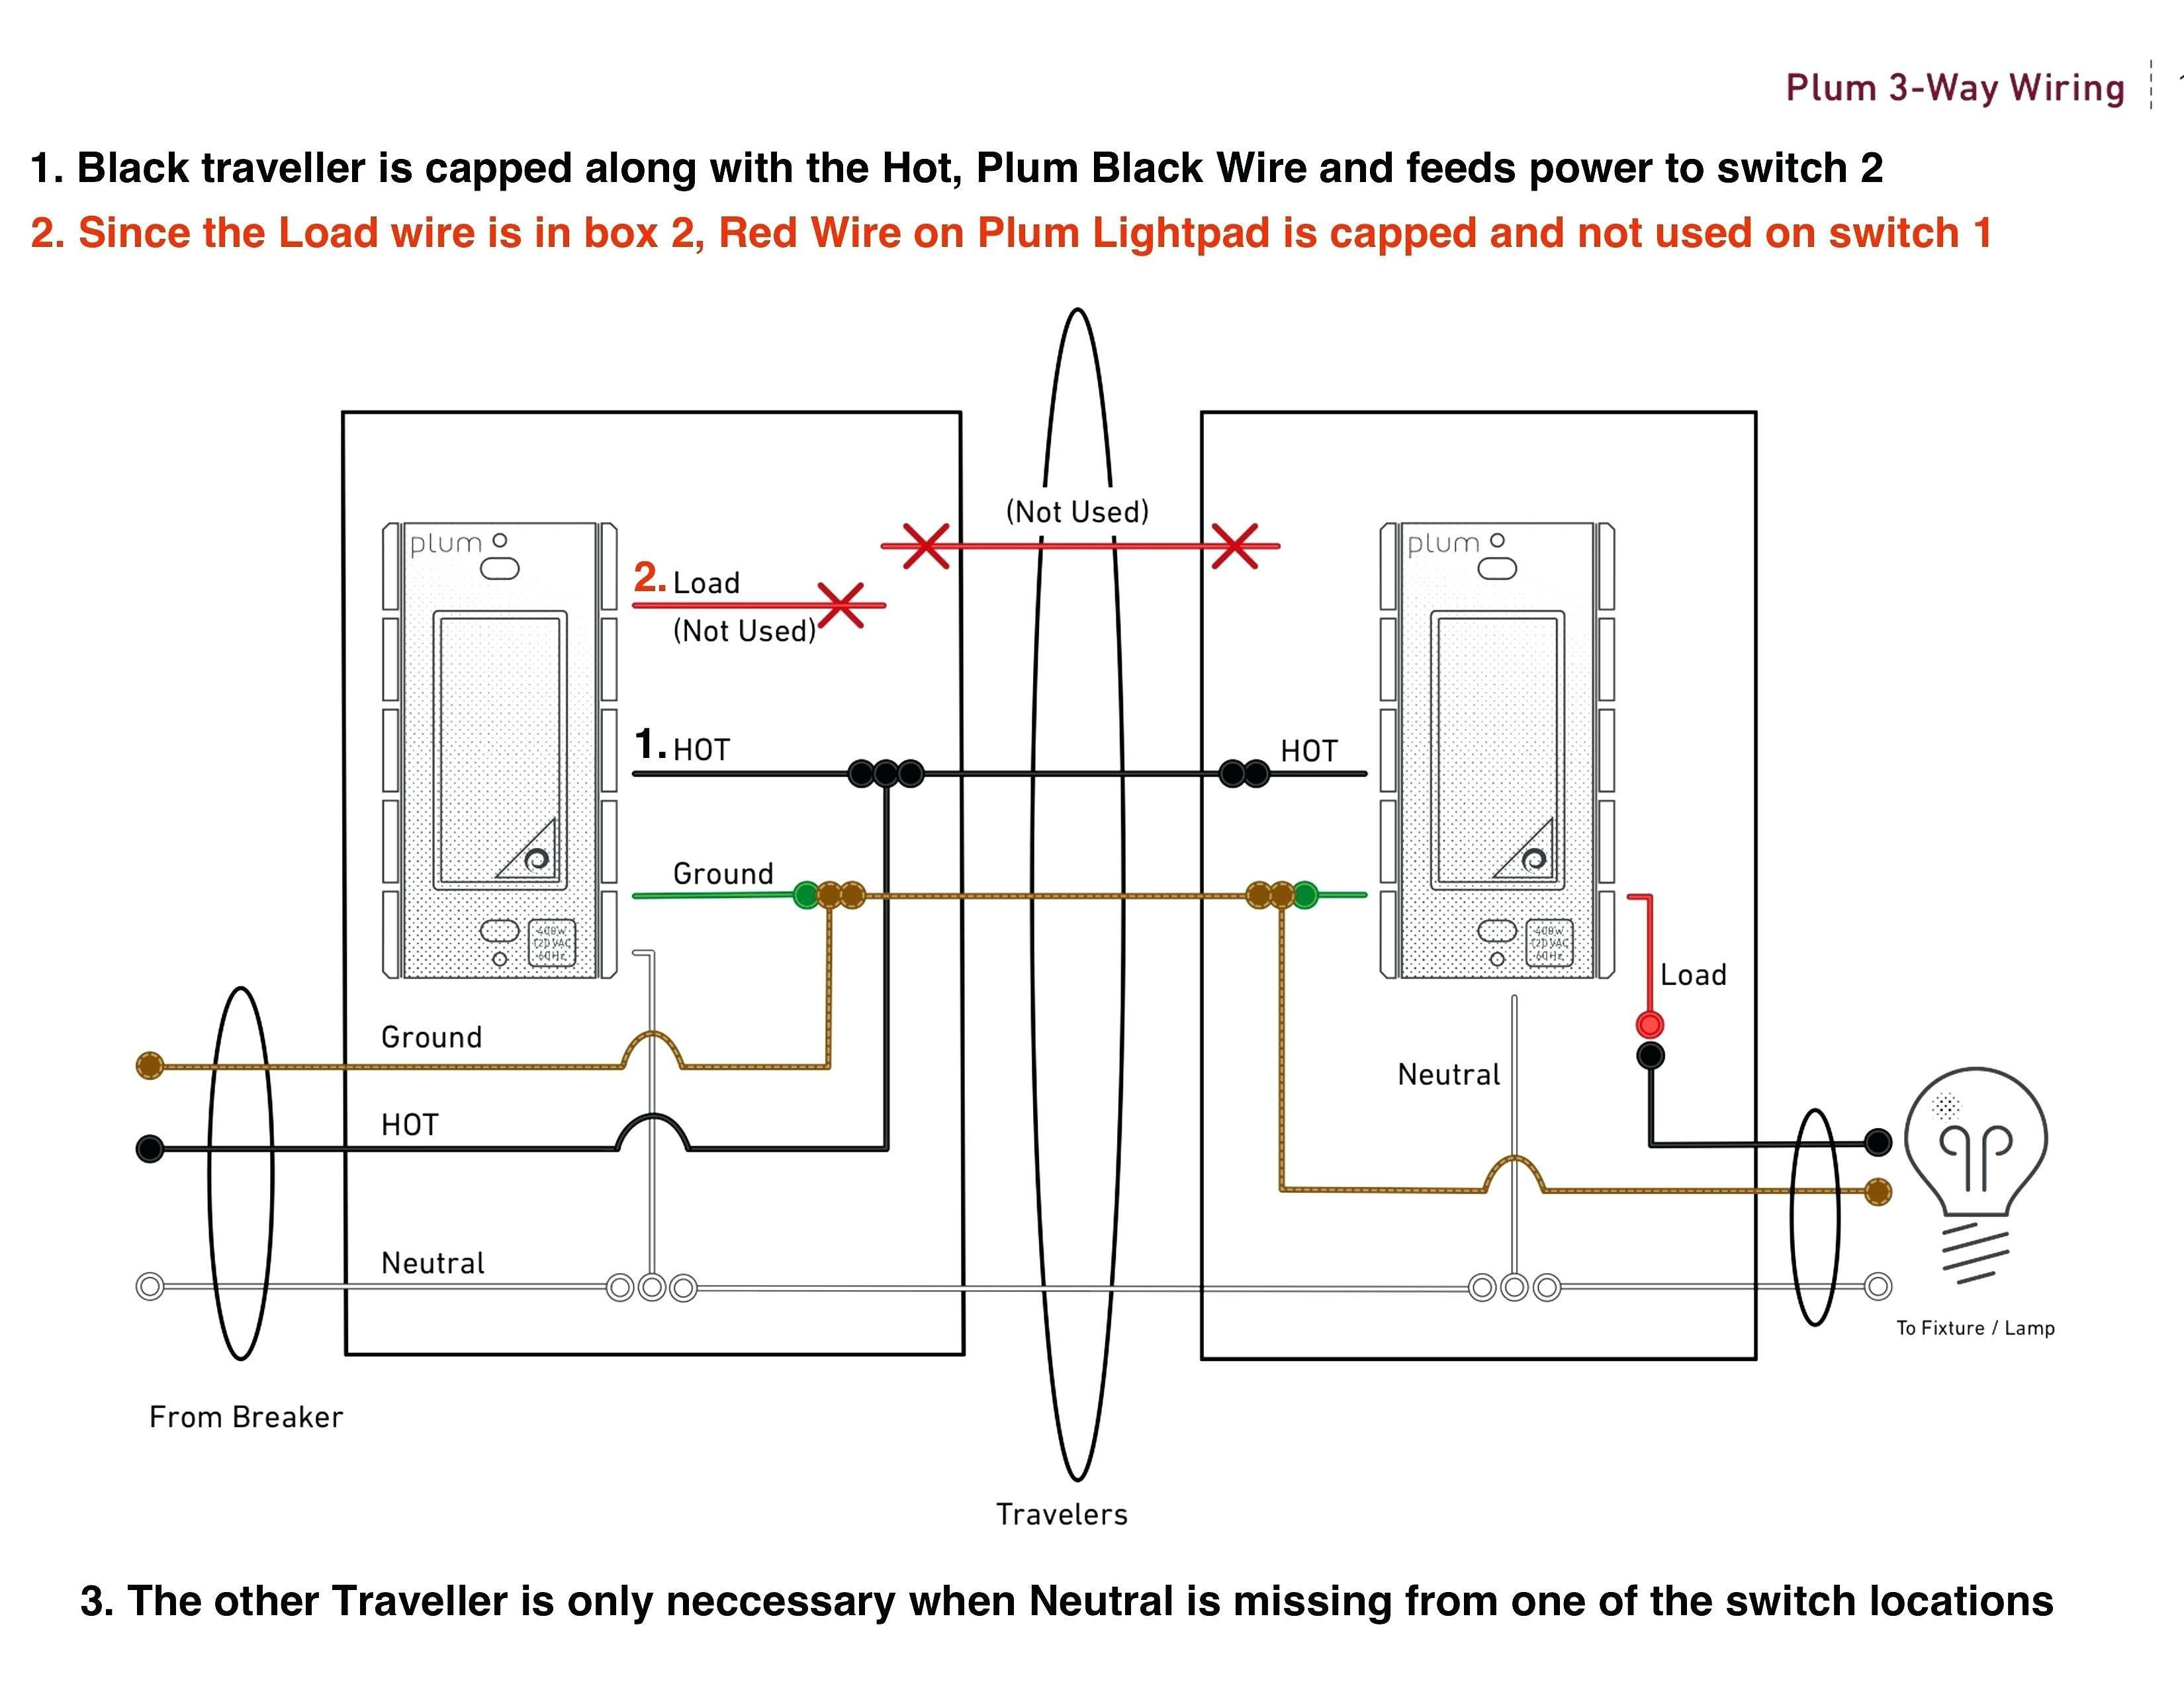 Holophane Light Wiring Diagrams - Bmw X3 Wiper Electrical Diagram -  vww-69.nescafe.jeanjaures37.fr | Holophane Predator Light Wiring Diagram |  | Wiring Diagram Resource